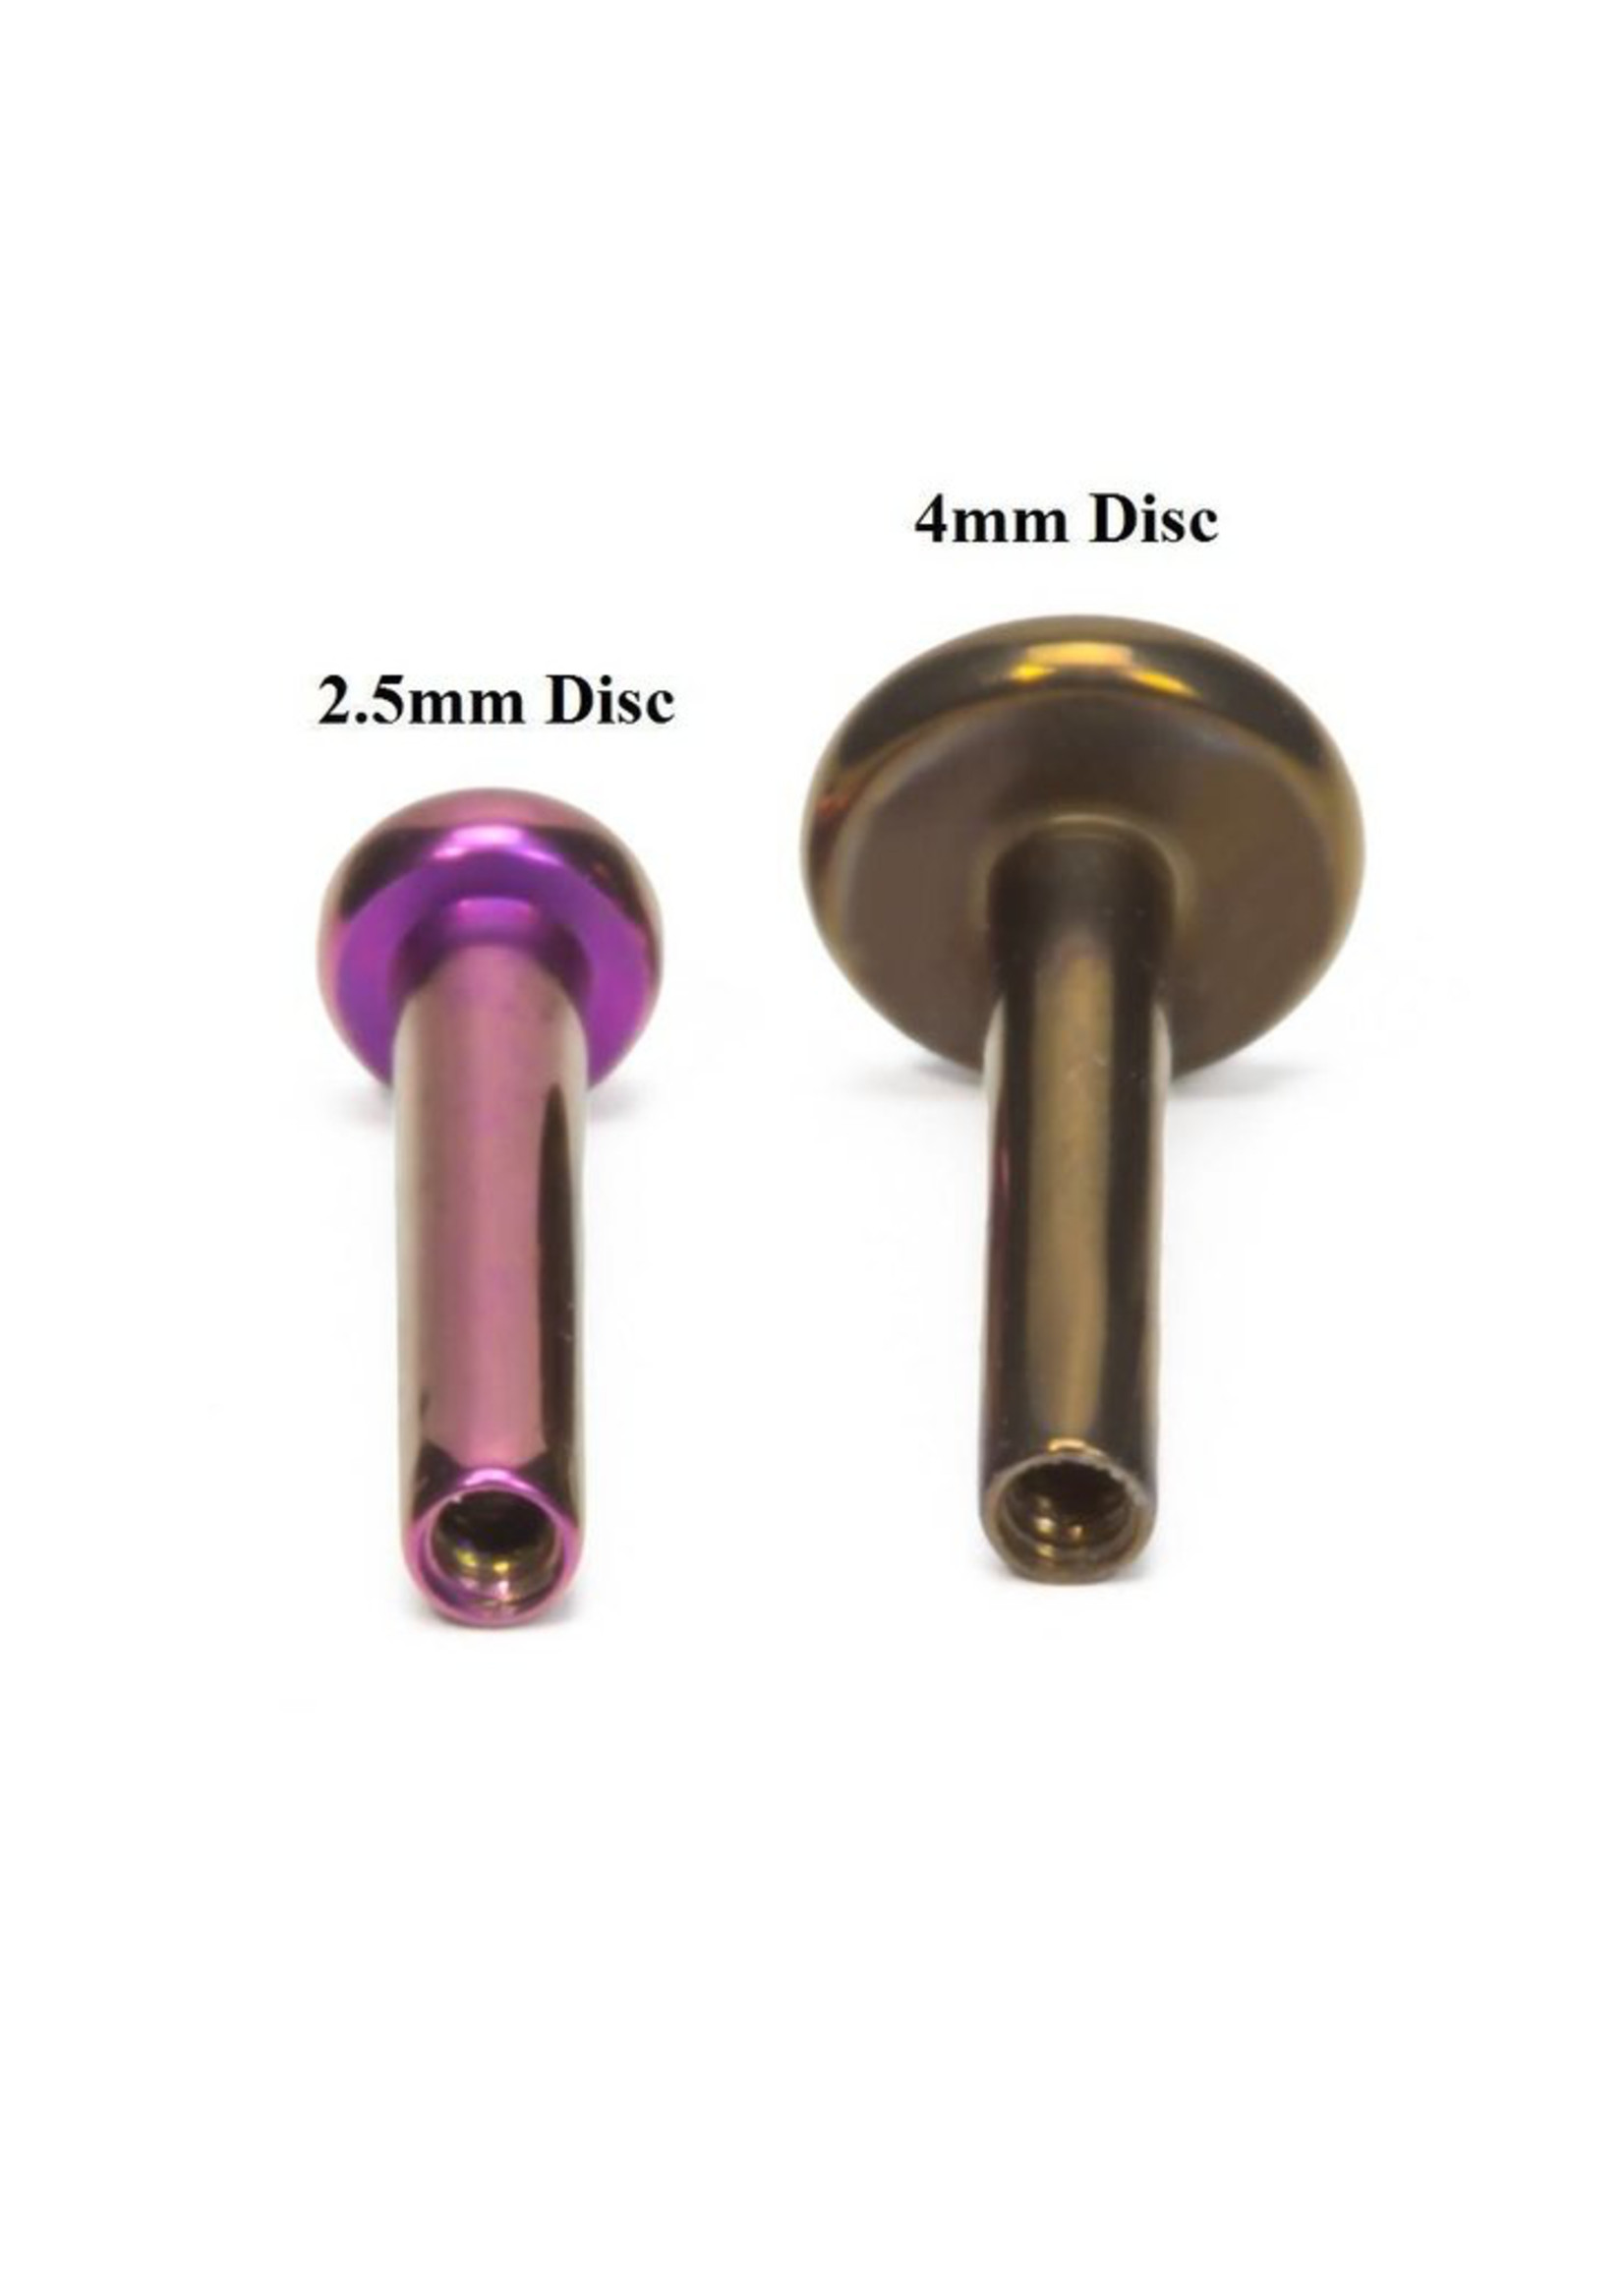 14g Titanium Threadless Flat Back Post (4mm Disk)